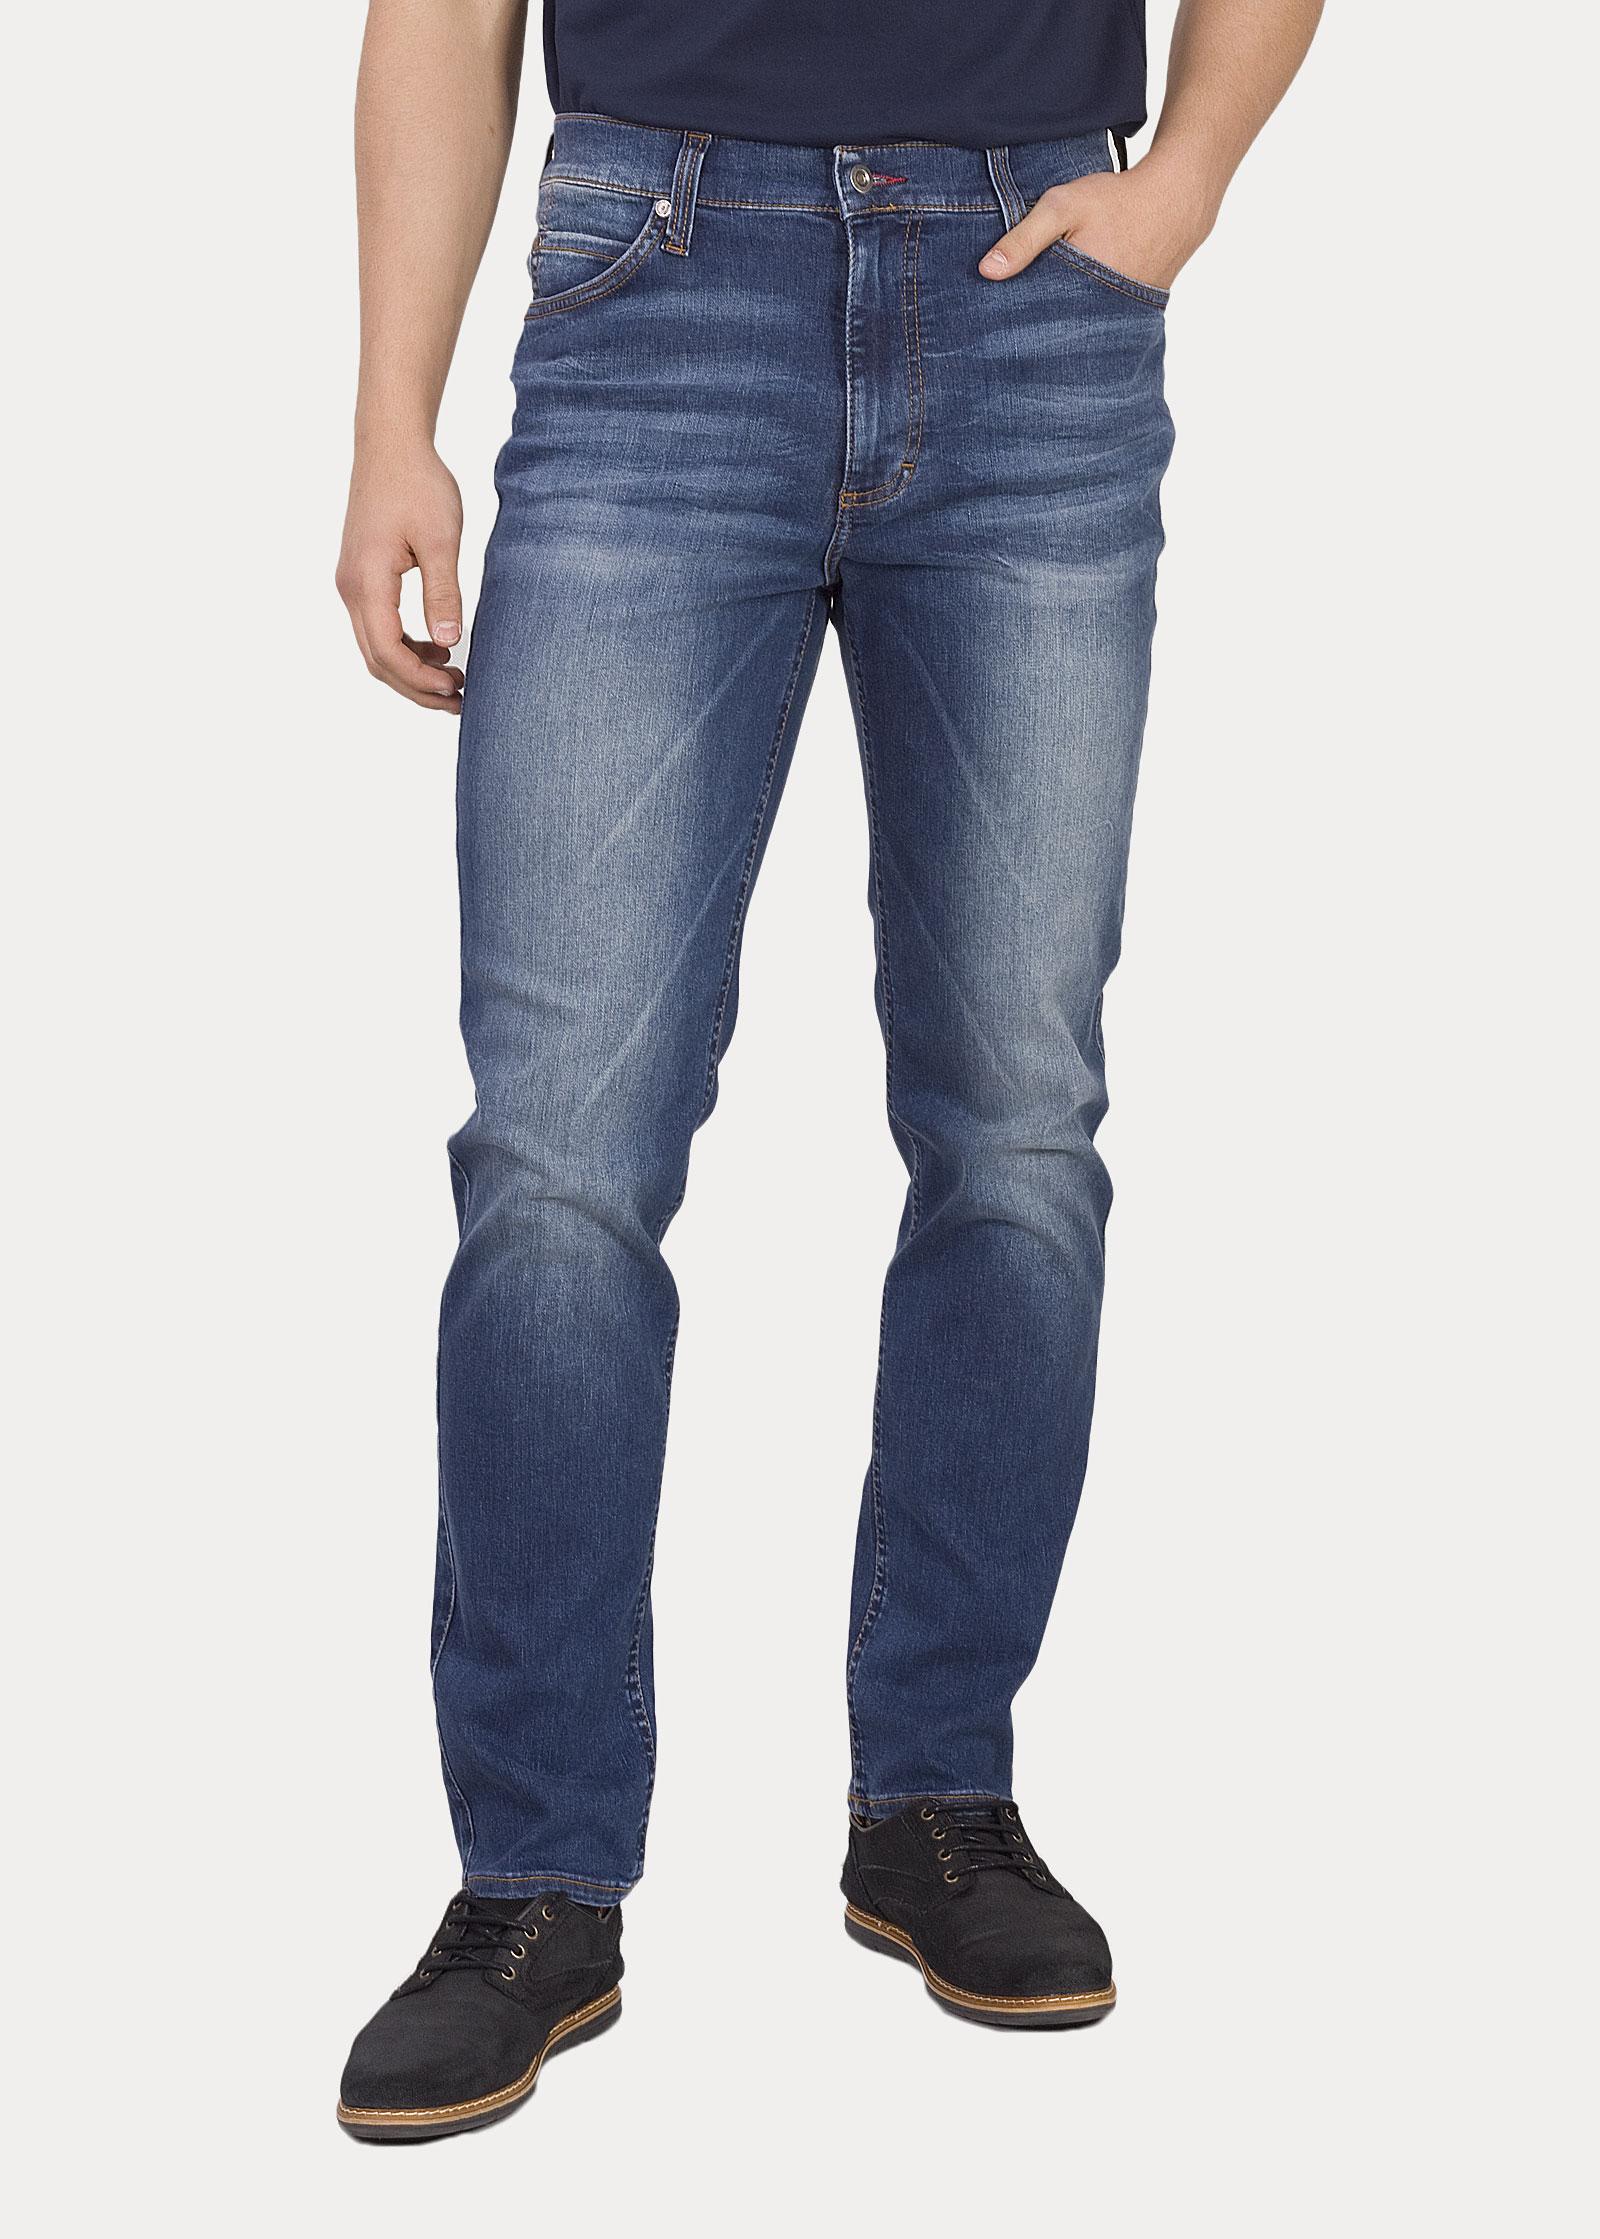 Herren Jeans Mustang Tramper Tapered Denim Blue